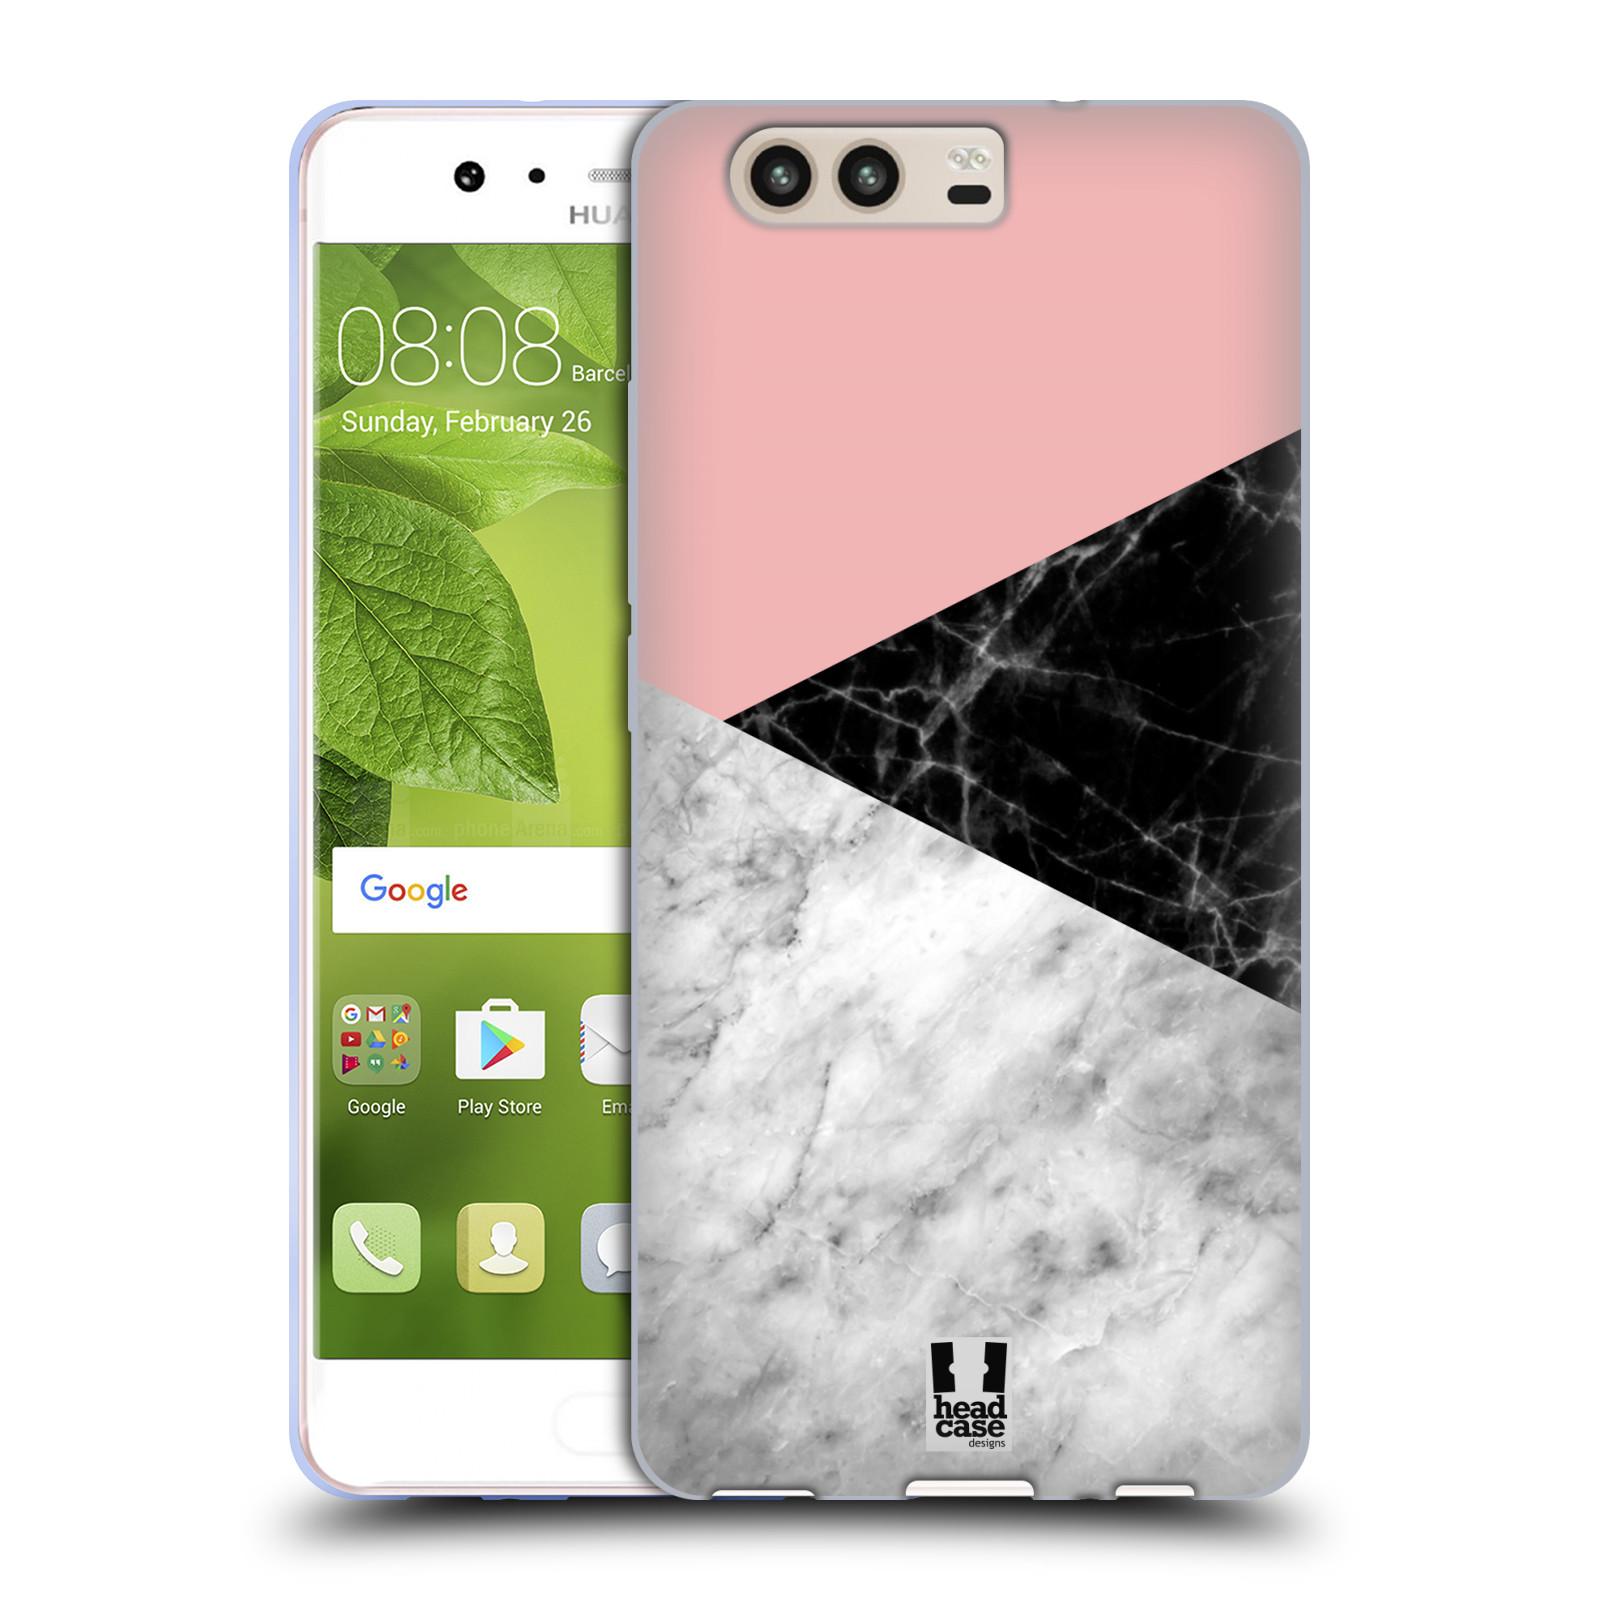 Silikonové pouzdro na mobil Huawei P10 - Head Case - Mramor mix